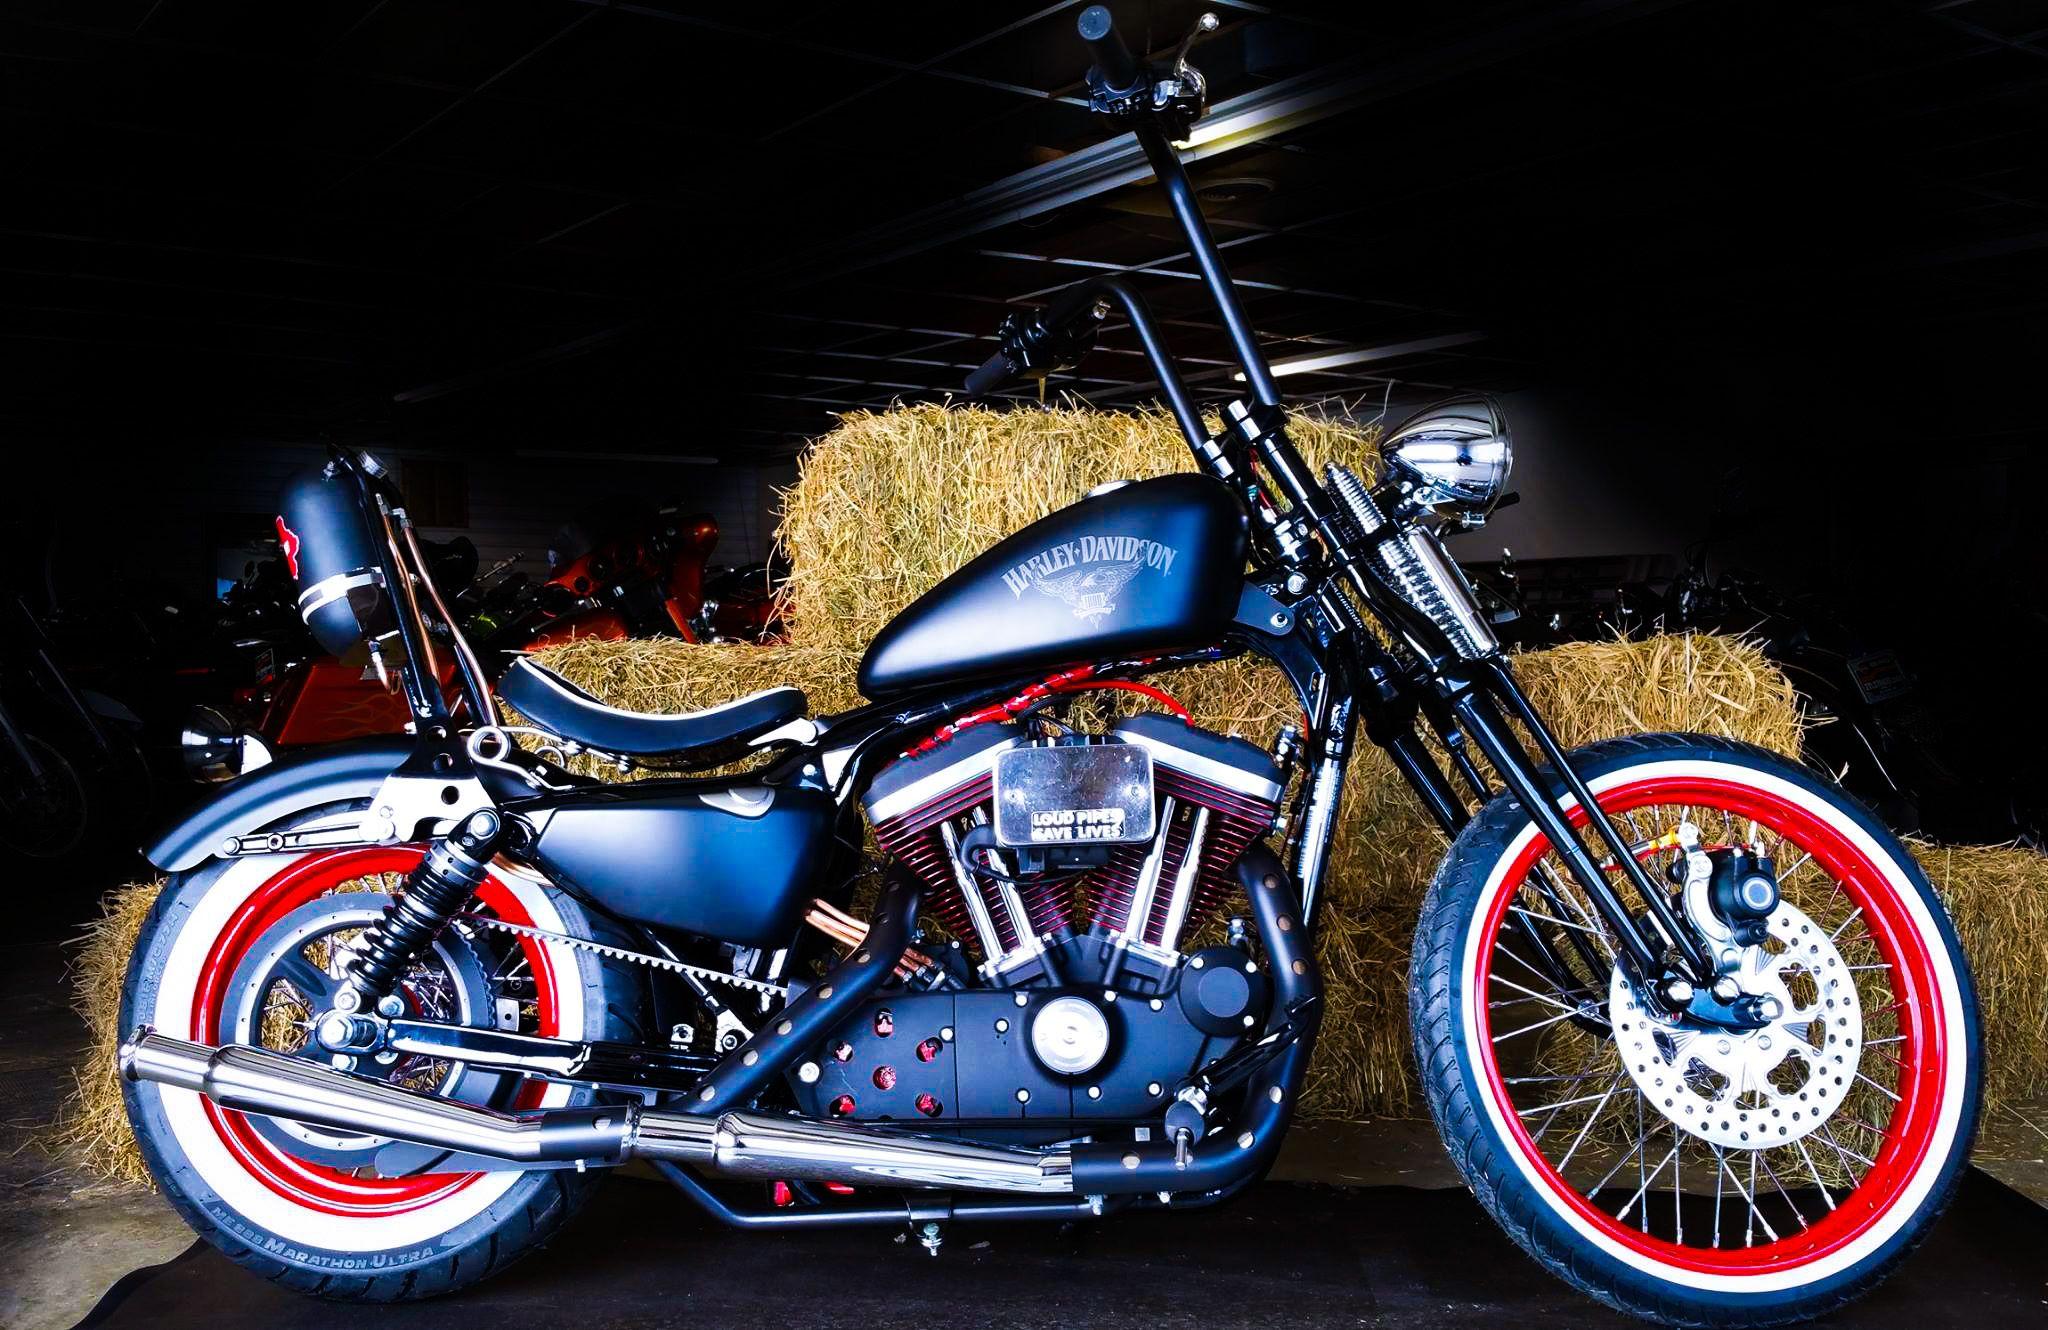 Zylstra Harley-Davidson Ames, Iowa - 2016 H-D® Sportster Iron 883